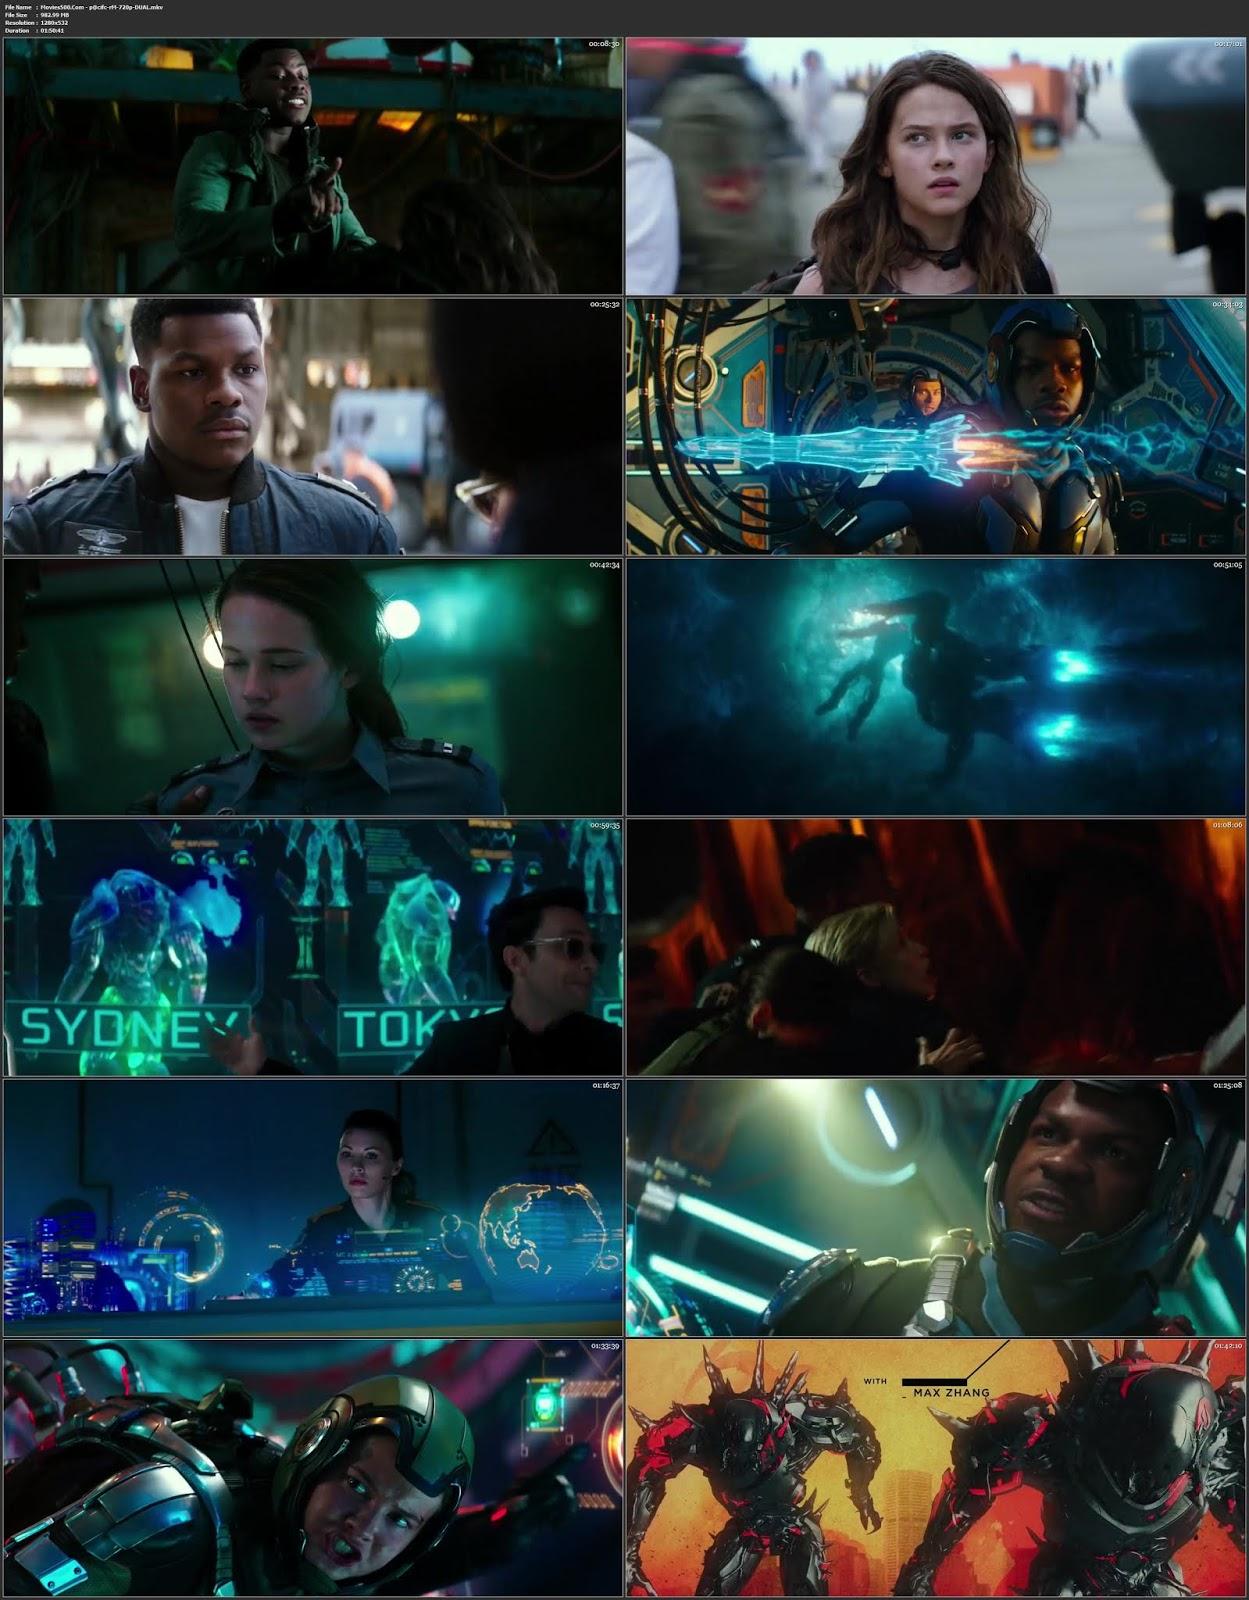 Pacific Rim 2 Uprising 2018 Dual Audio Hindi Full Movie HDRip 720p at movies500.site